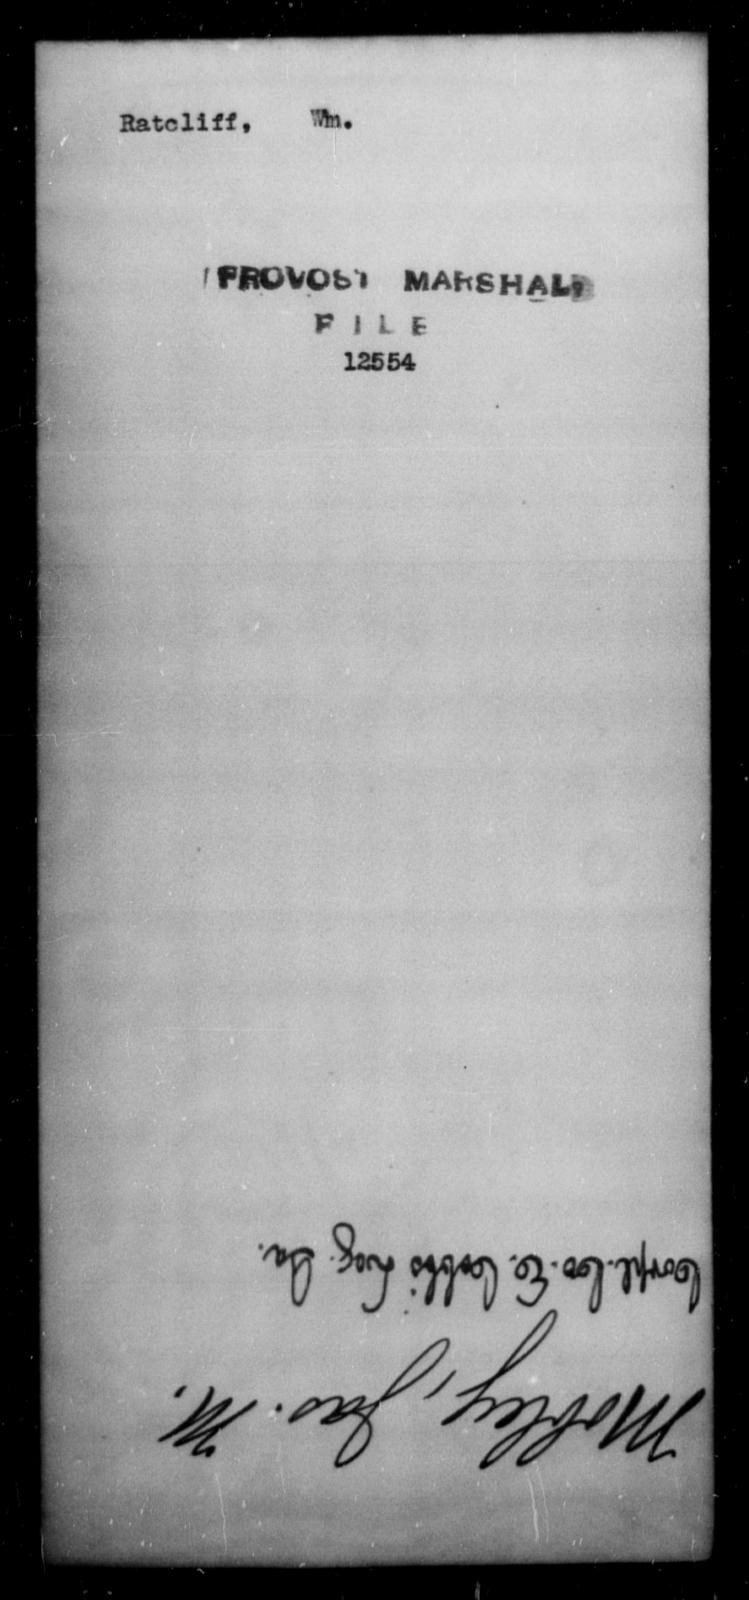 Ratcliffe, Wm - State: [Blank] - Year: [Blank]